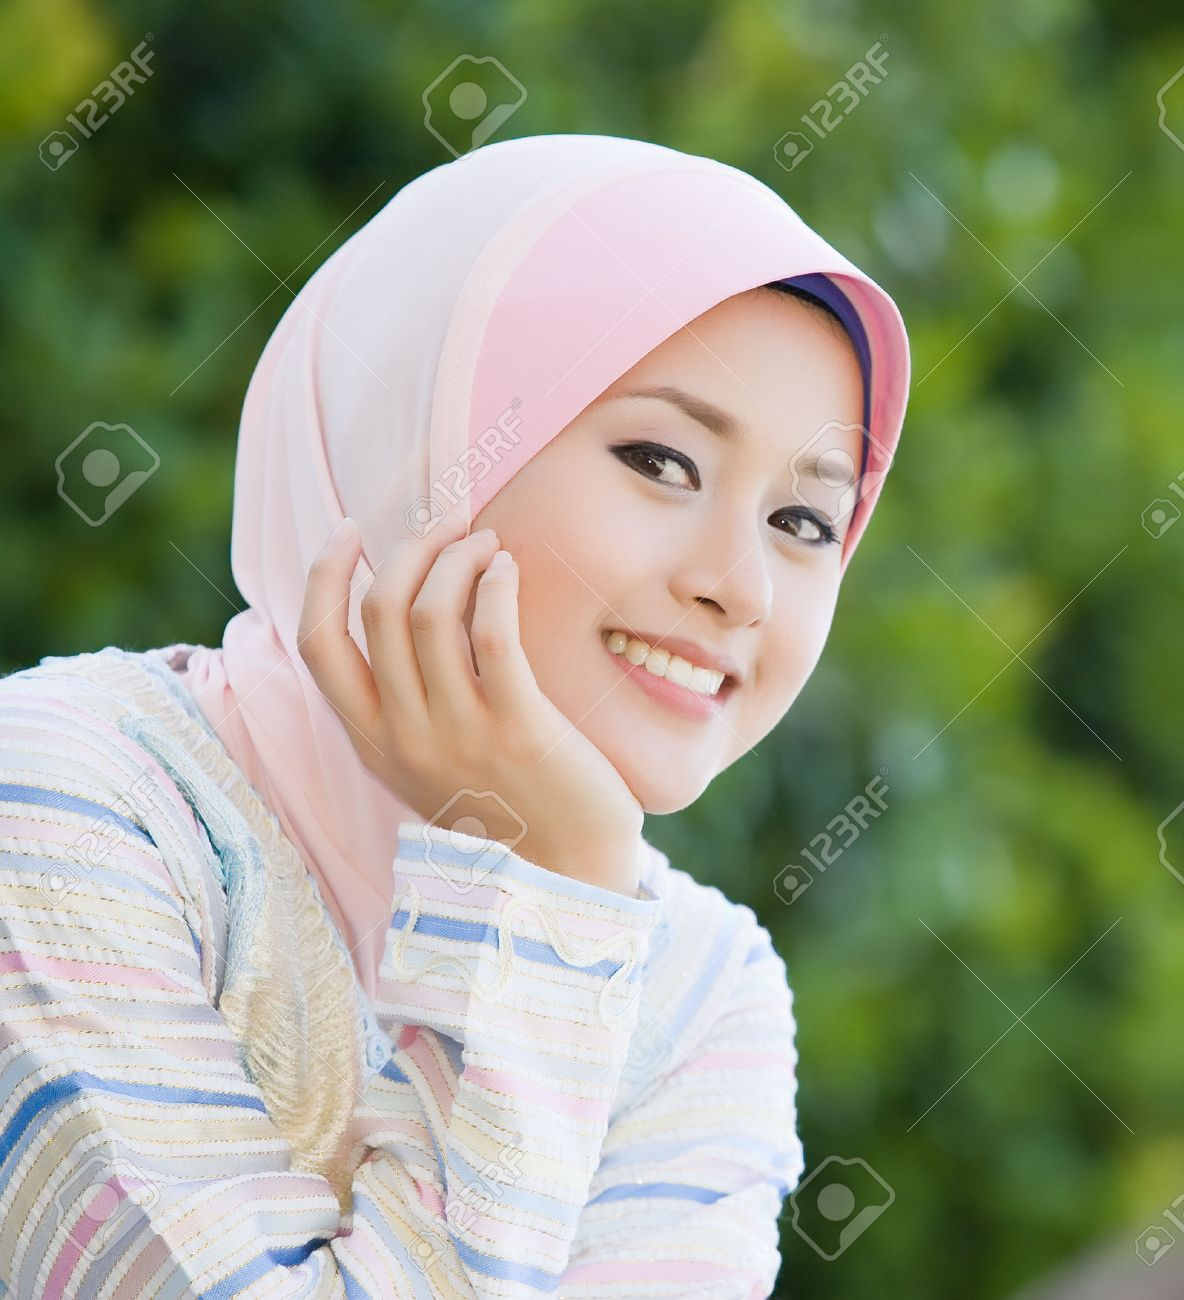 Perfect smiling of the <b>malay girl</b> Stock Photo - 32845039 - 32845039-Perfect-smiling-of-the-malay-girl-Stock-Photo-malay